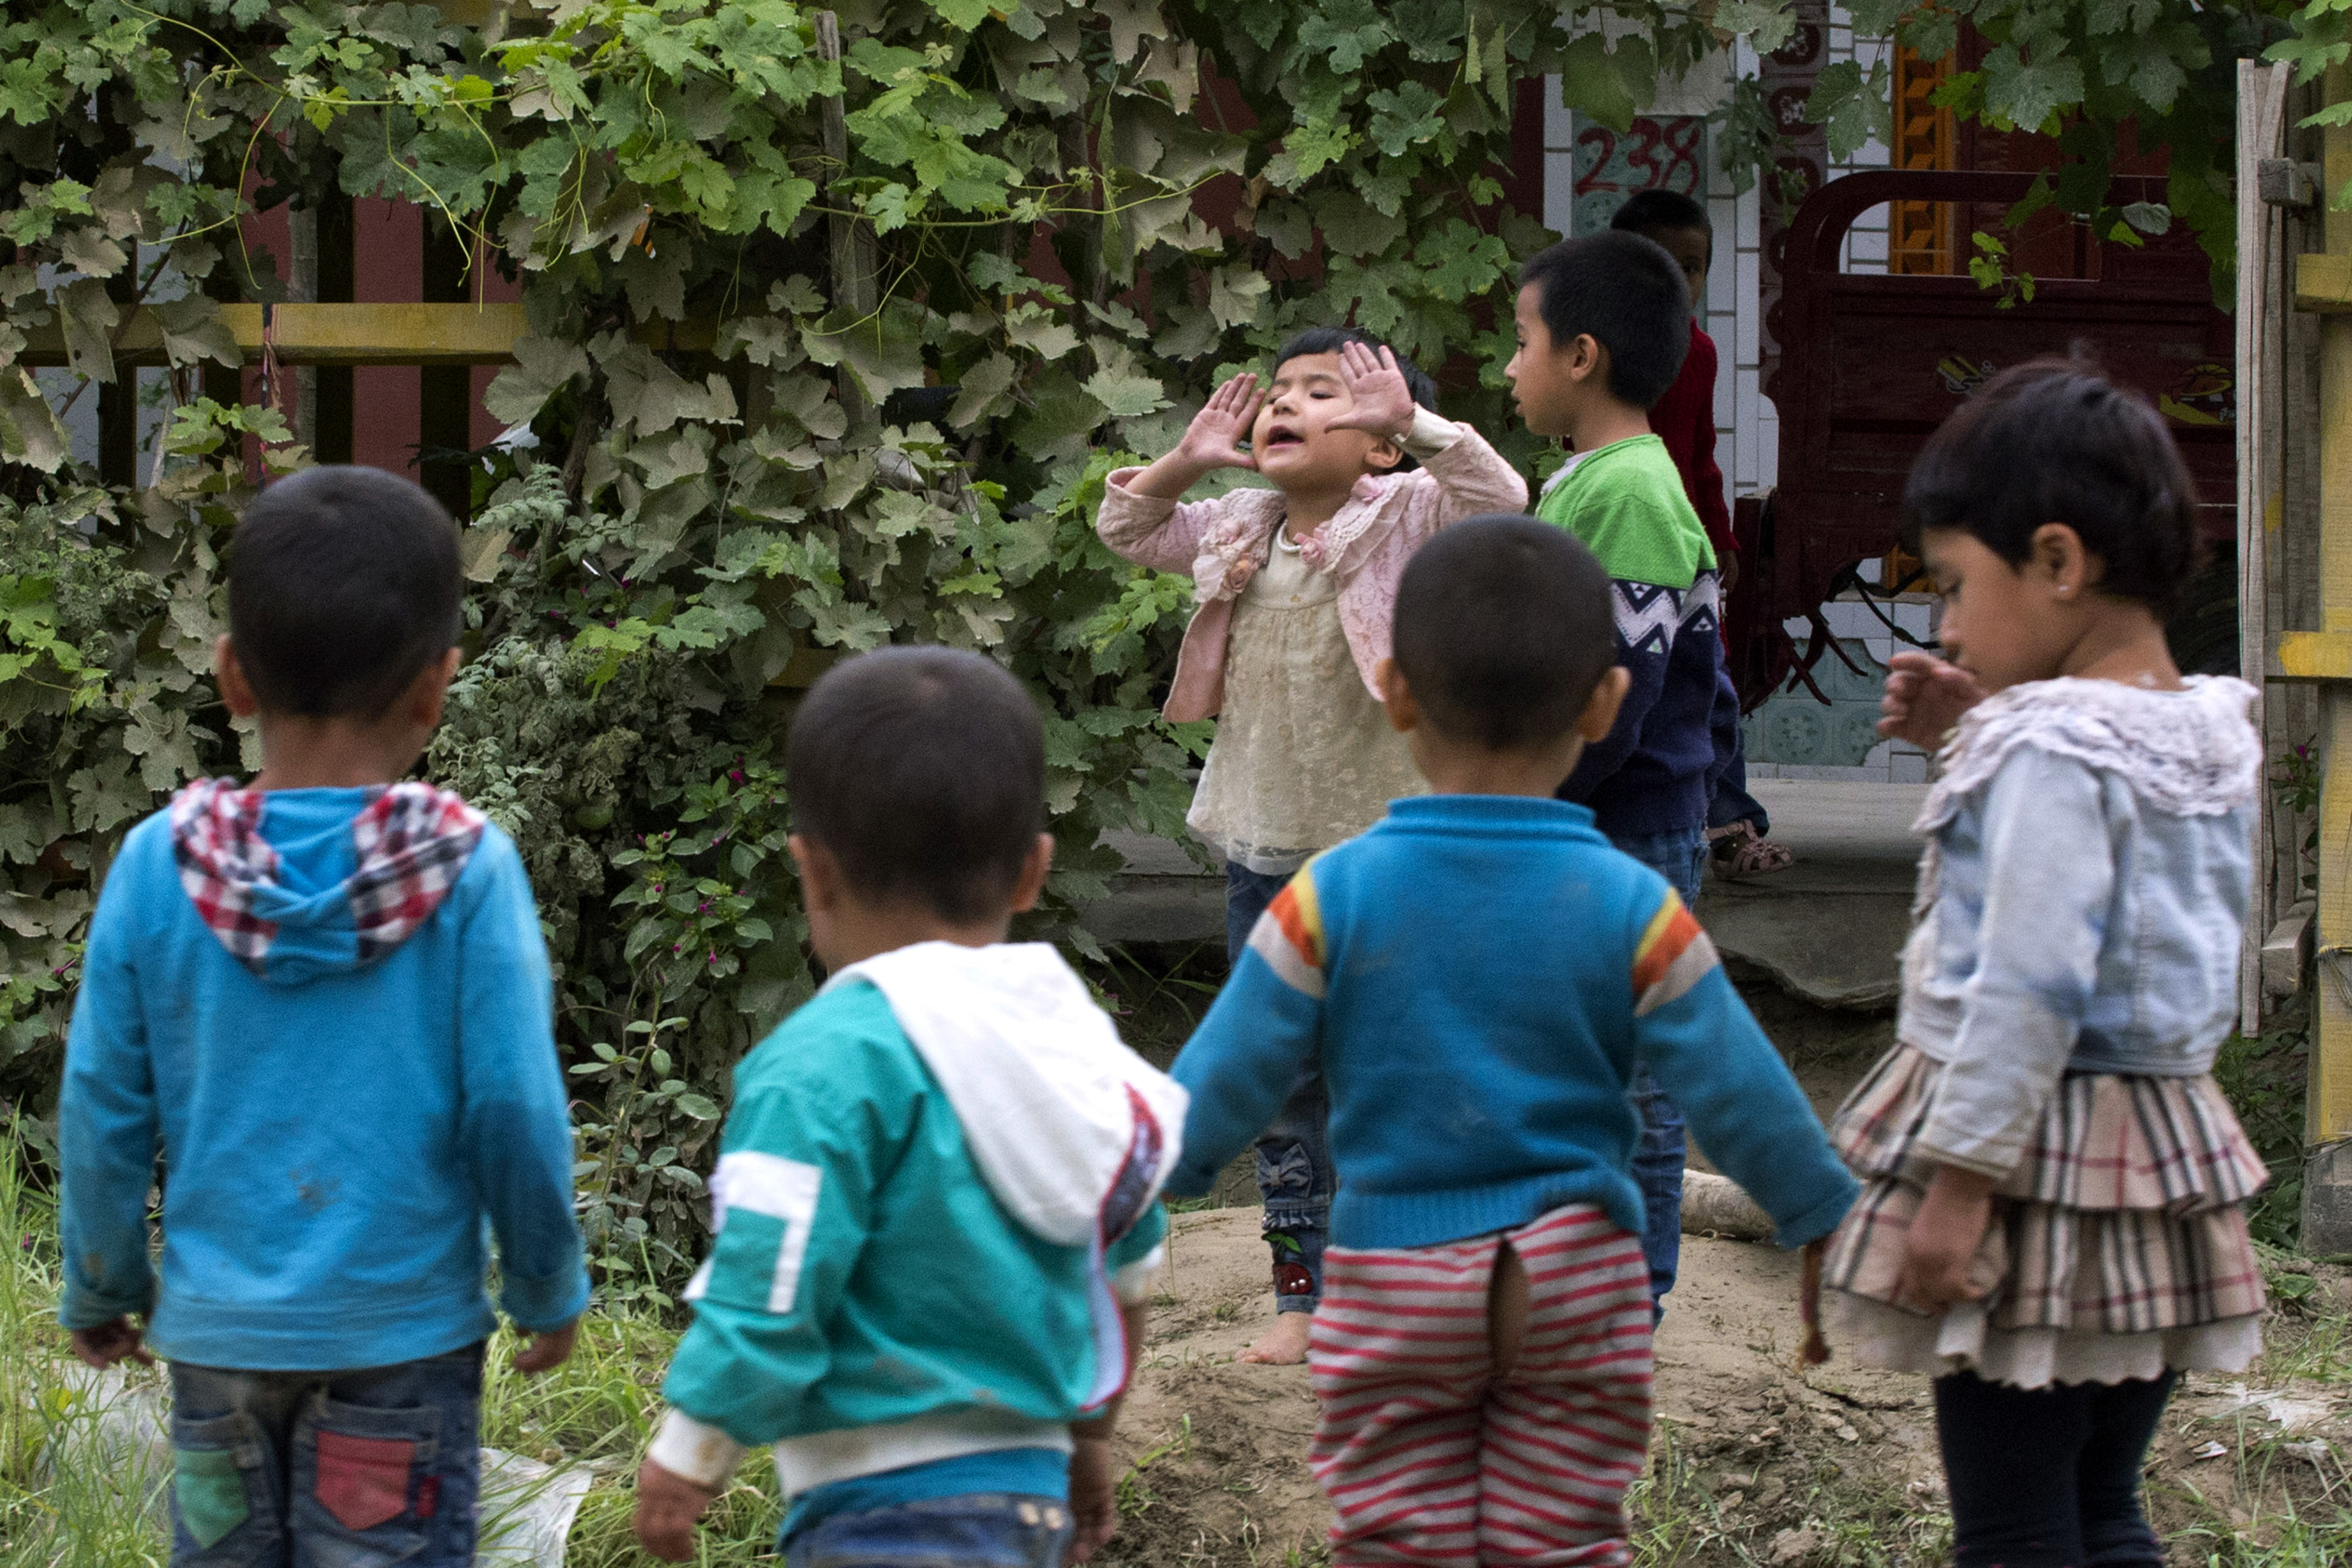 China cuts Uighur births with IUDs, abortion, sterilization